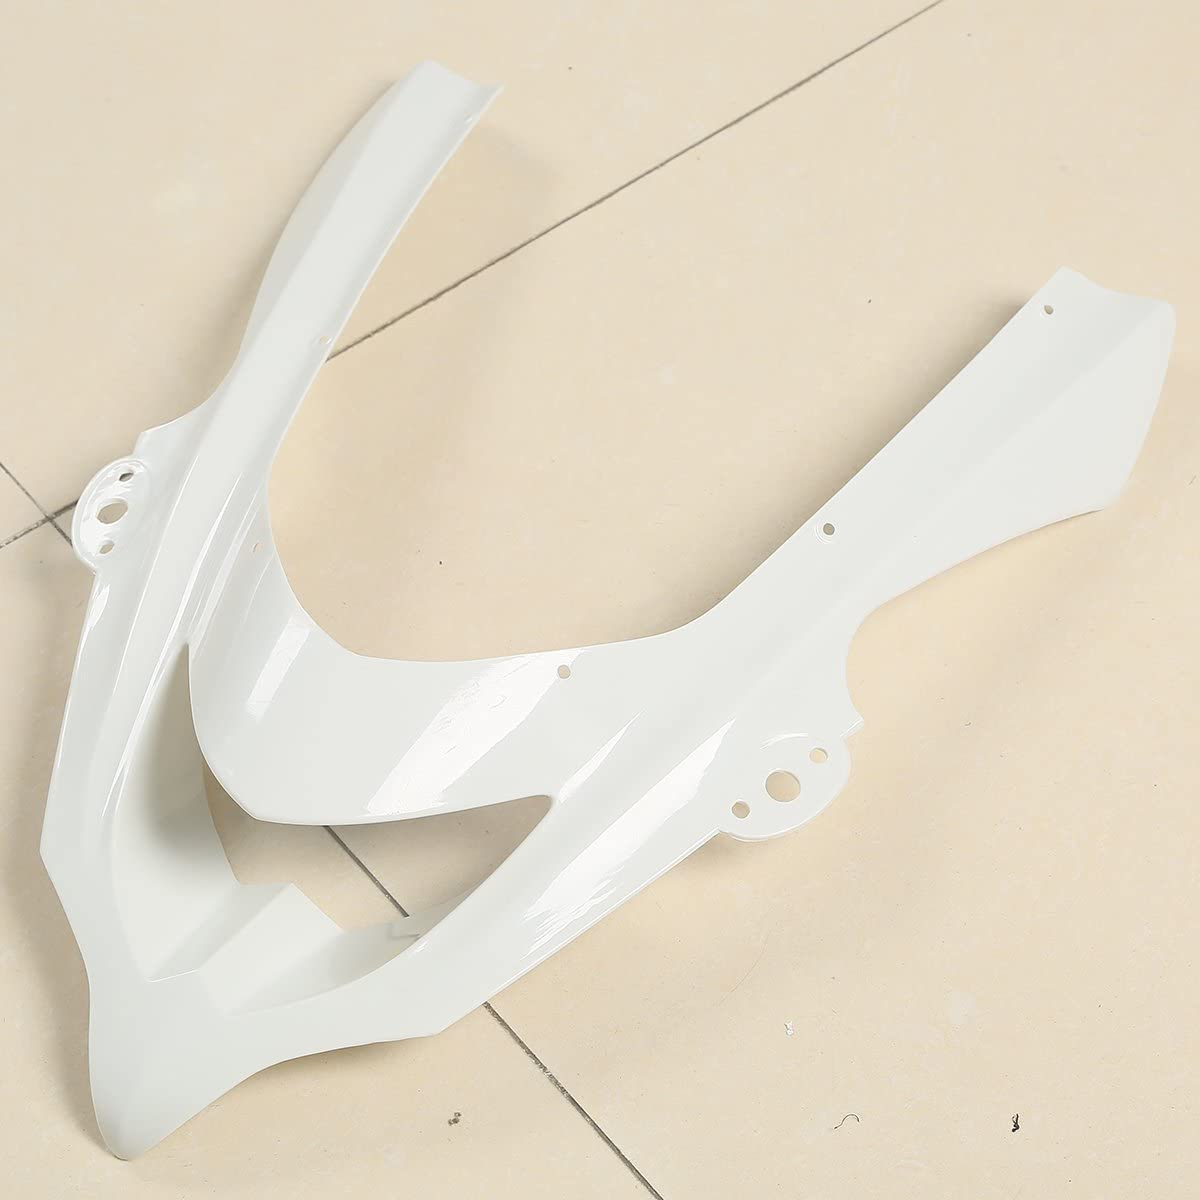 XMT-MOTO Fairing Body Set Kits fits for KAWASAKI Ninja ZX10R ZX-10R ZX 10R 2004-2005,Unpainted White